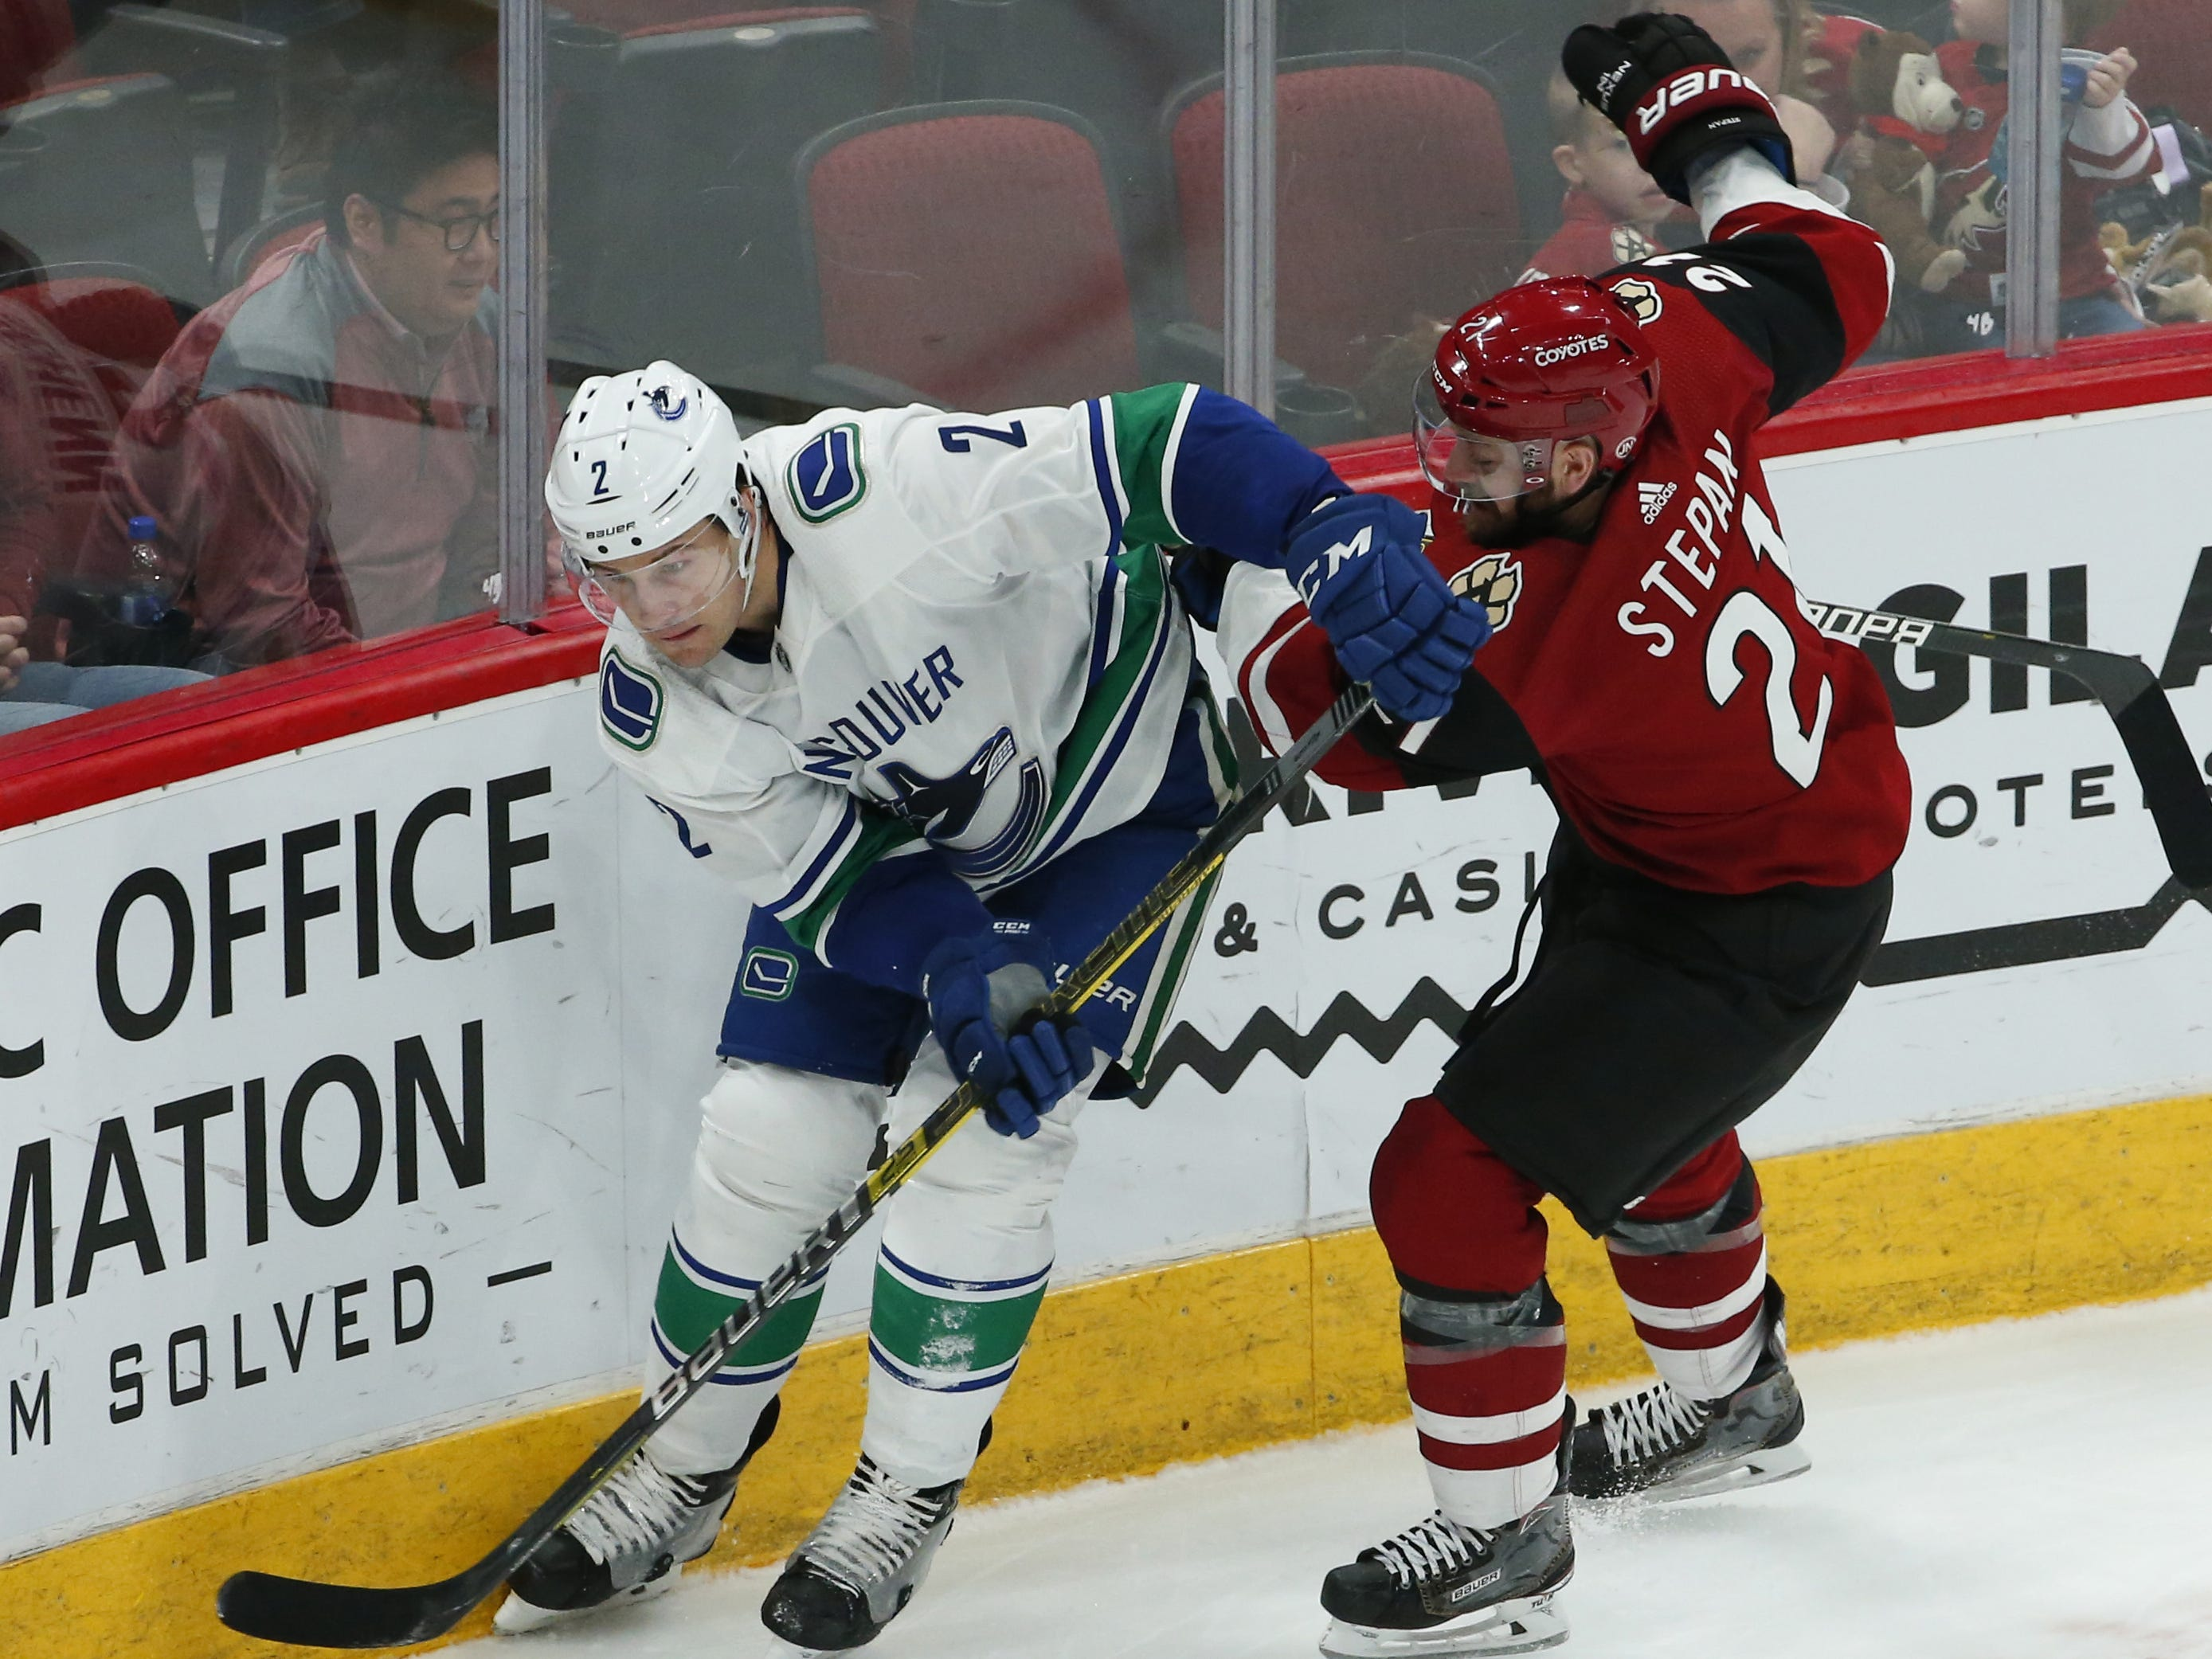 Vancouver Canucks defenseman Luke Schenn (2) battles Arizona Coyotes center Derek Stepan (21)  for the puck during a NHL game at Gila River Arena in Glendale on February 28.